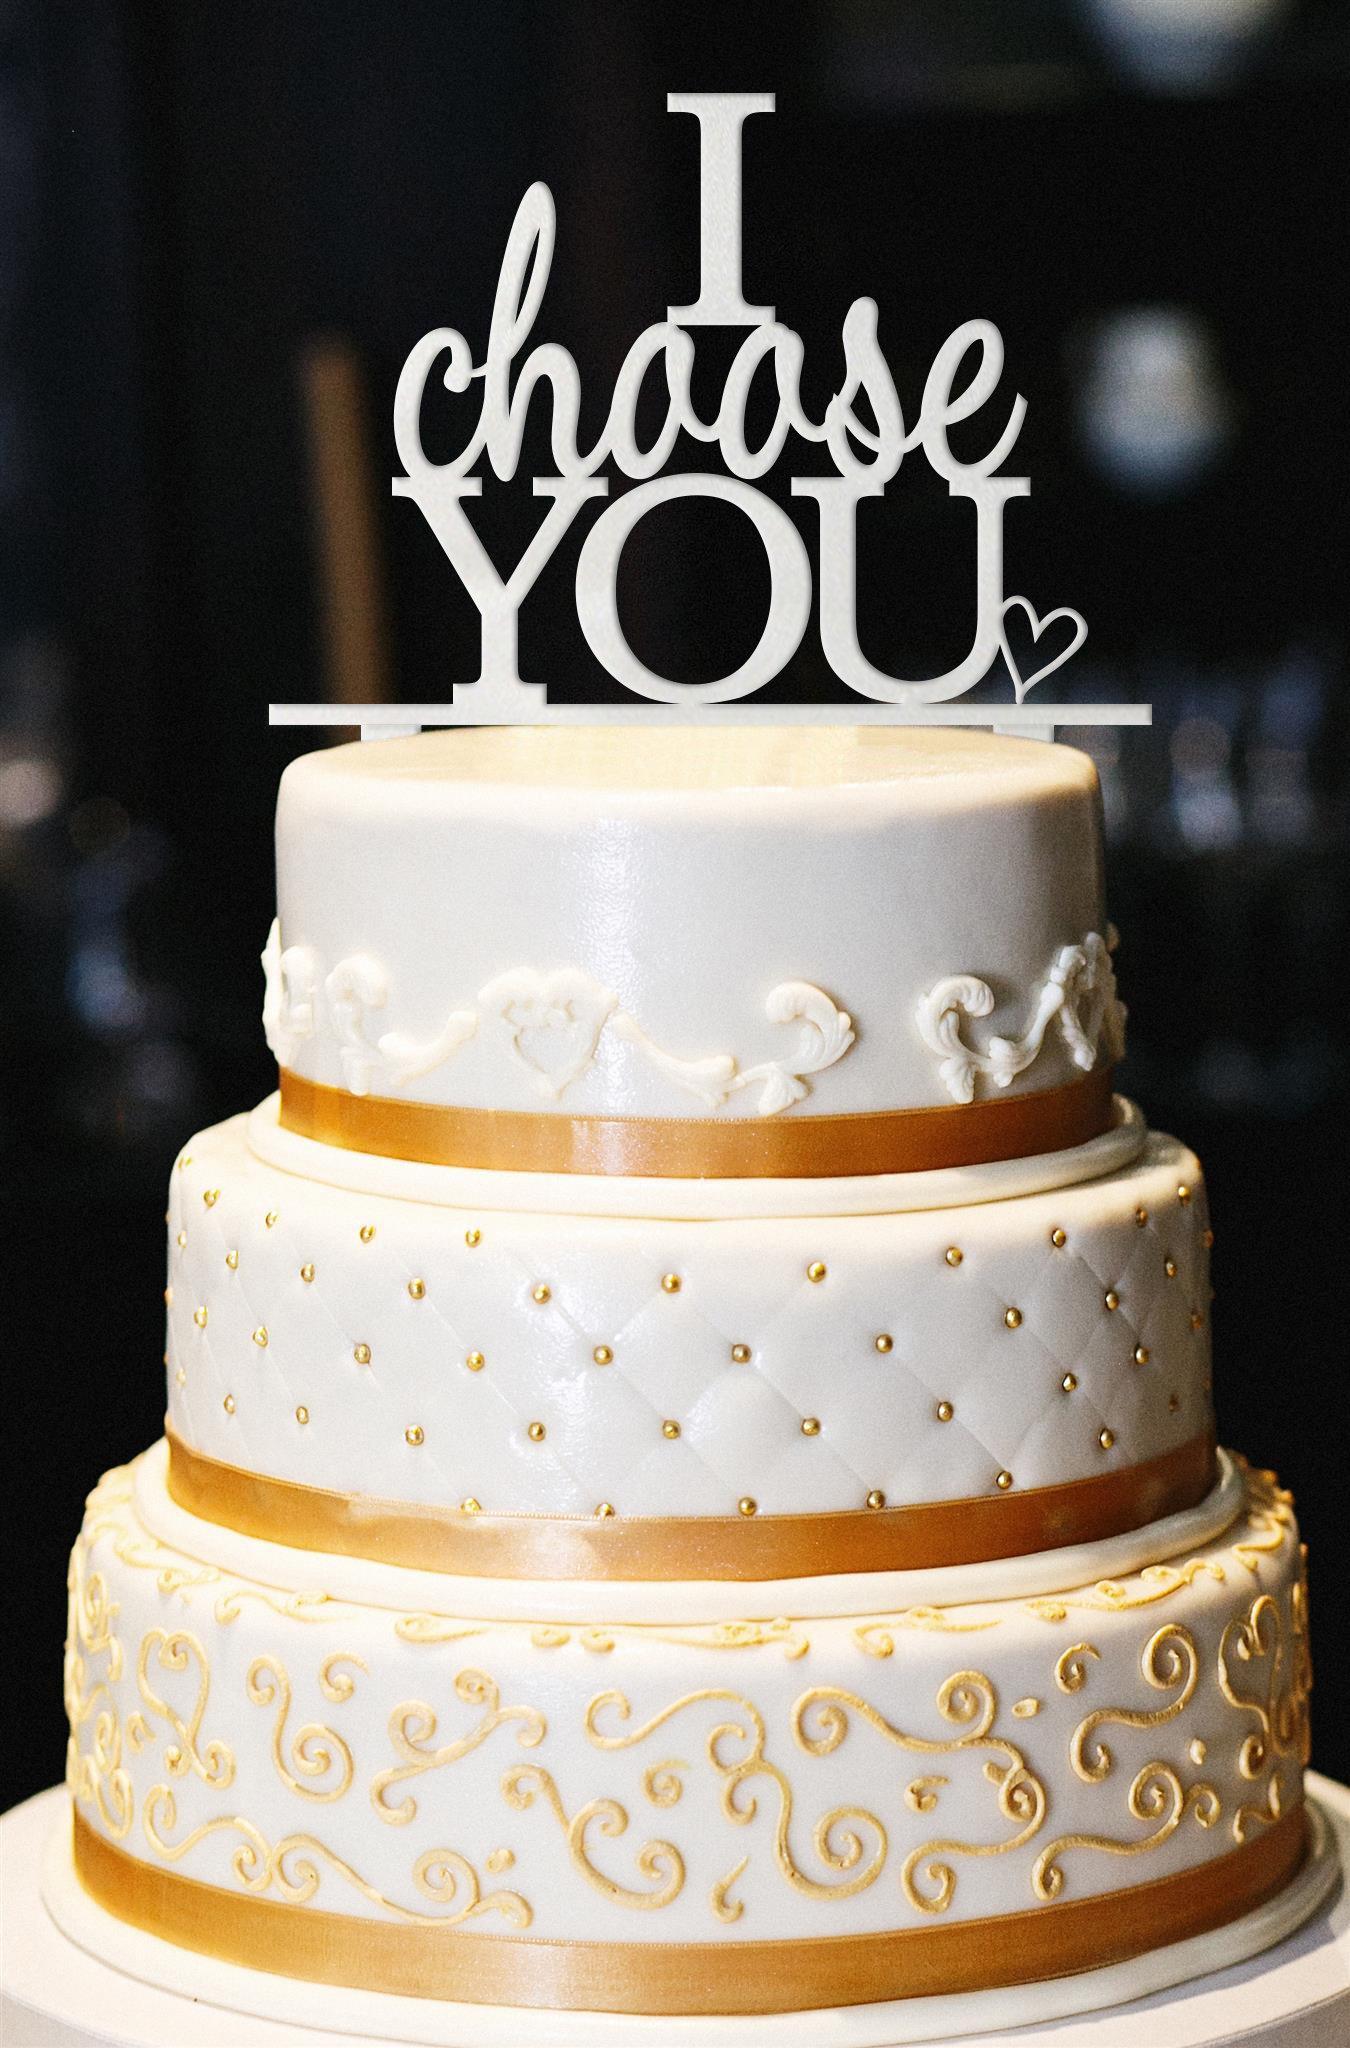 I Choose You w/ Heart Wedding Cake Topper, Glitter Wedding Cake Topper, Engagement Cake Topper, Gold Cake Topper, Gold Glitter Topper (15'', Pearl White)